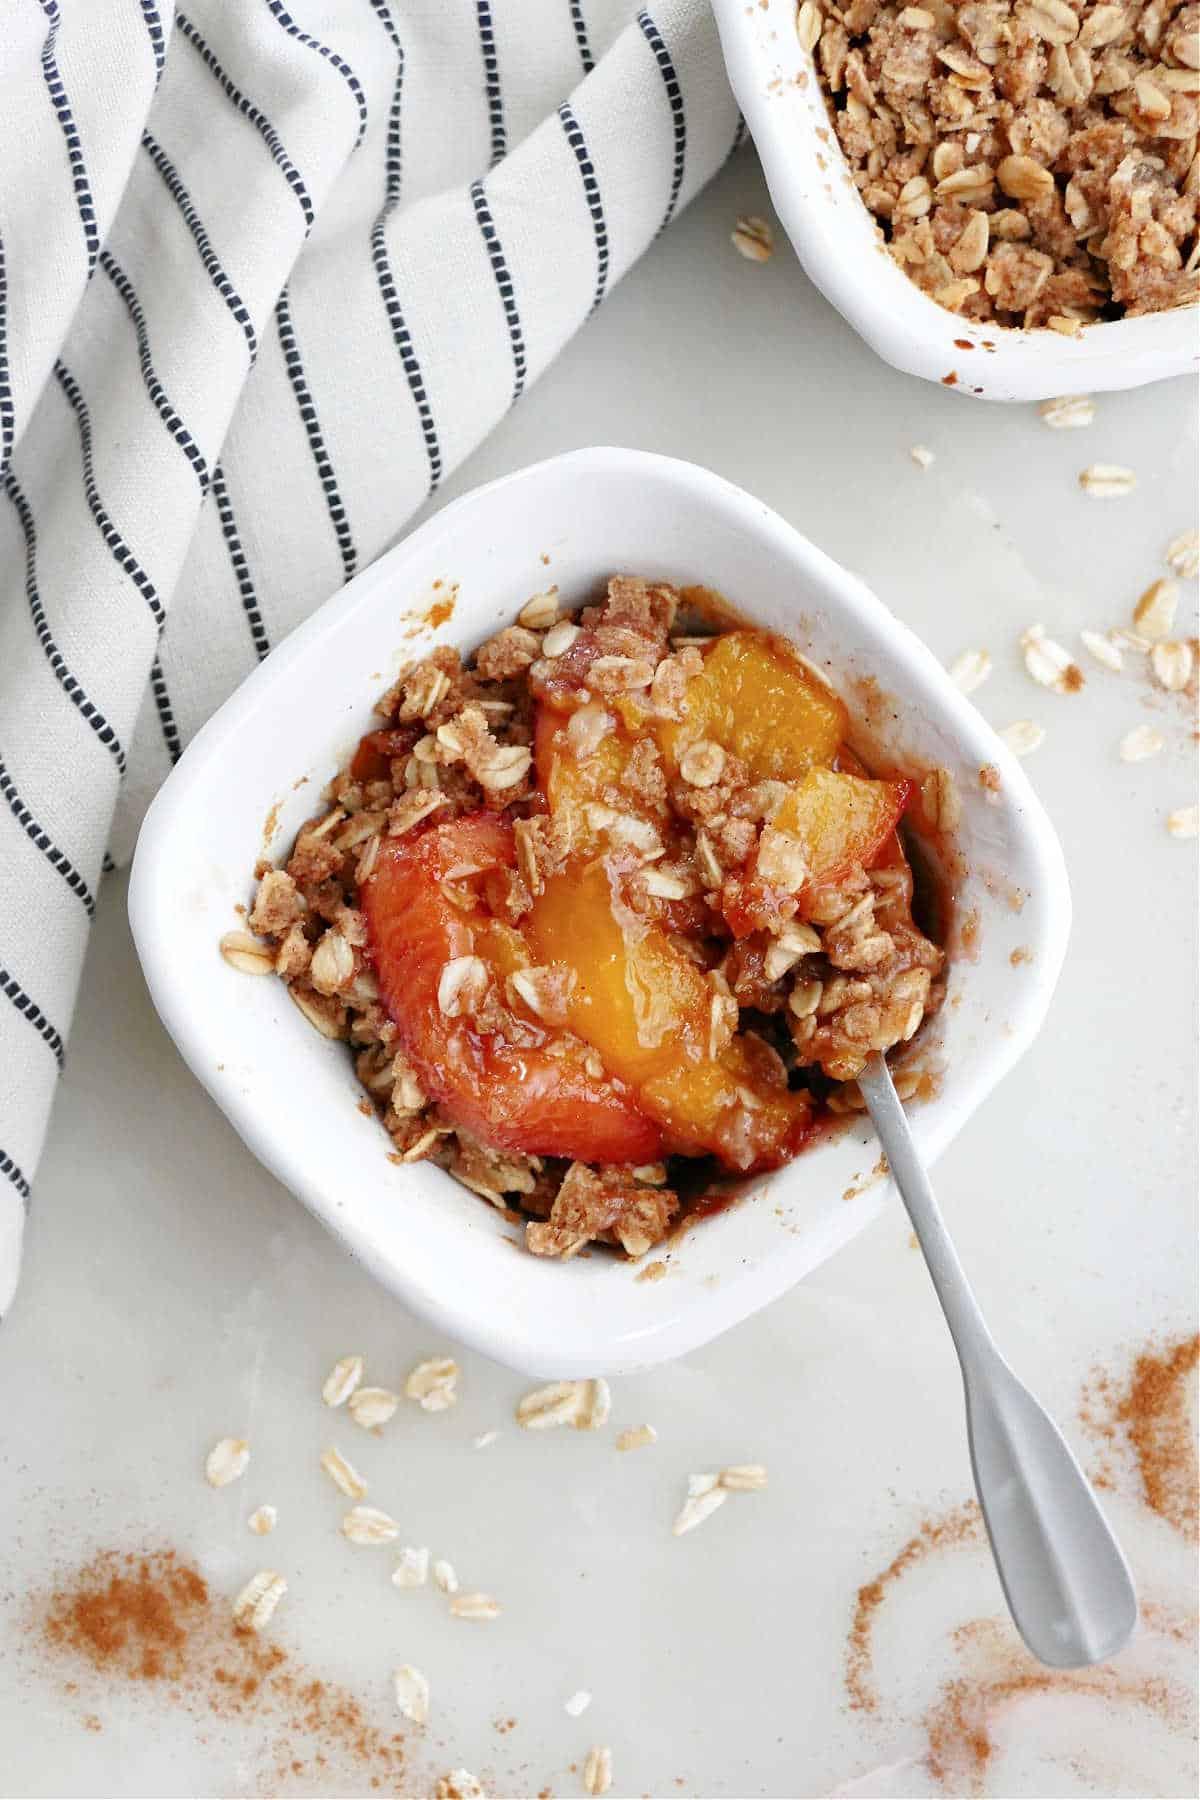 mini peach cobbler in a ramekin with a small spoon next to a napkin